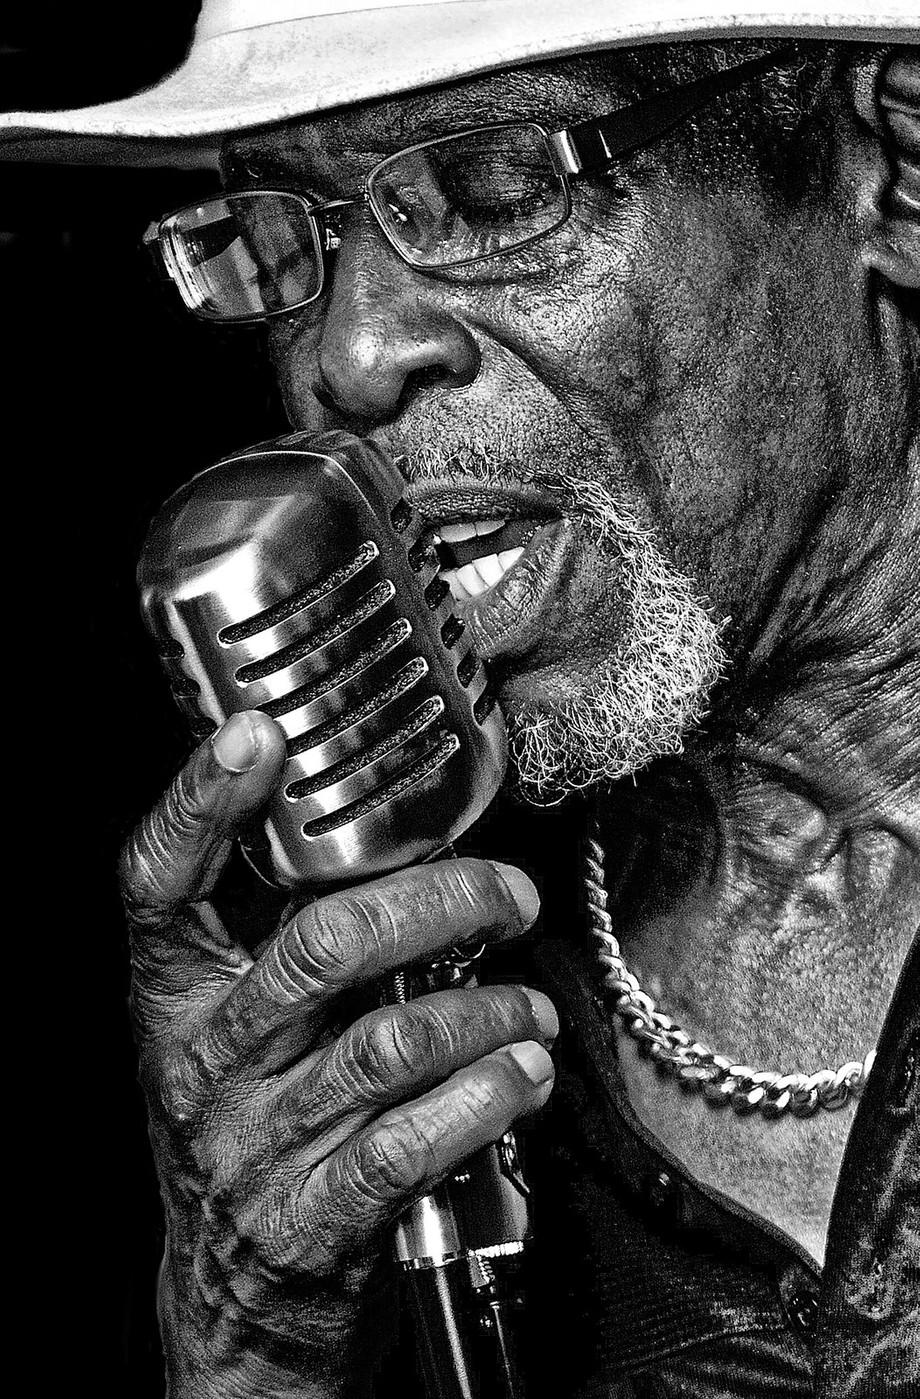 The Soul Man by Bobwhite - Monochrome Creative Compositions Photo Contest